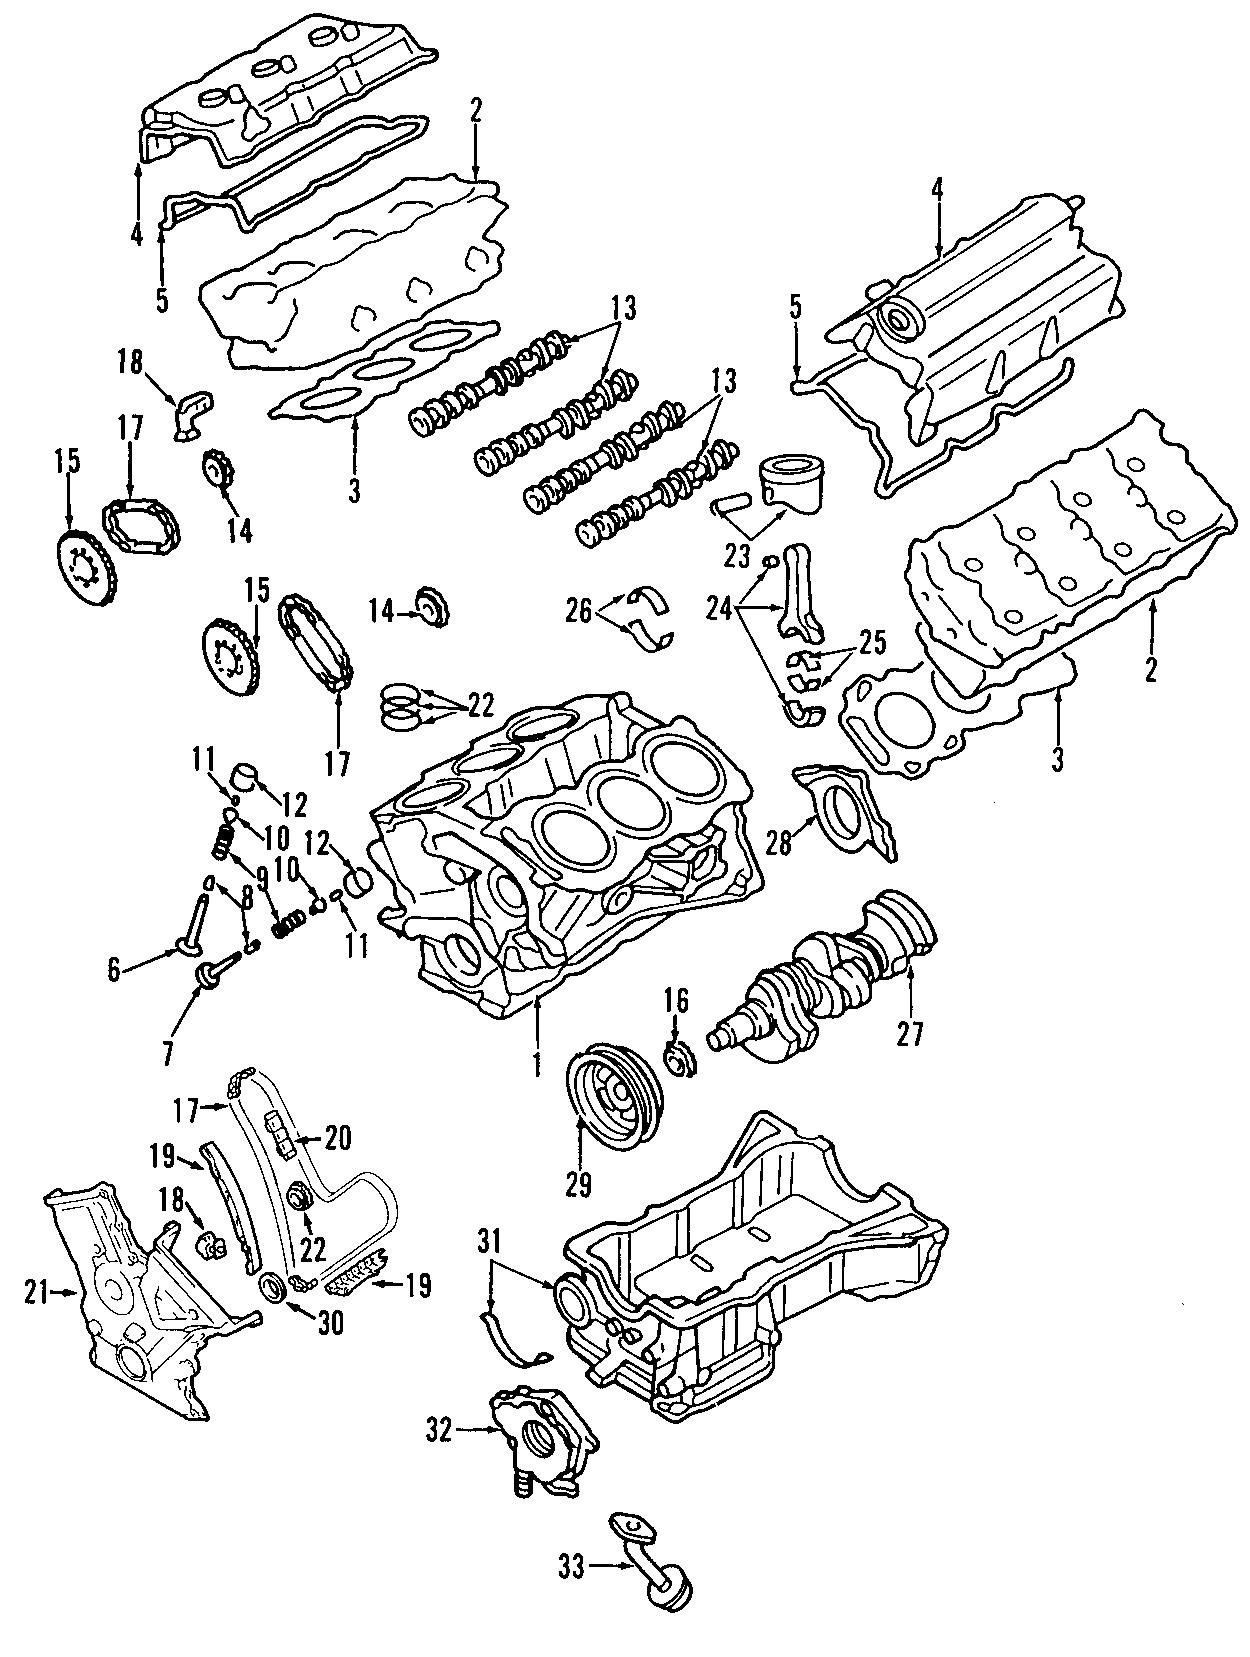 Lincoln MKX Engine Crankshaft Main Bearing. Grade, STD